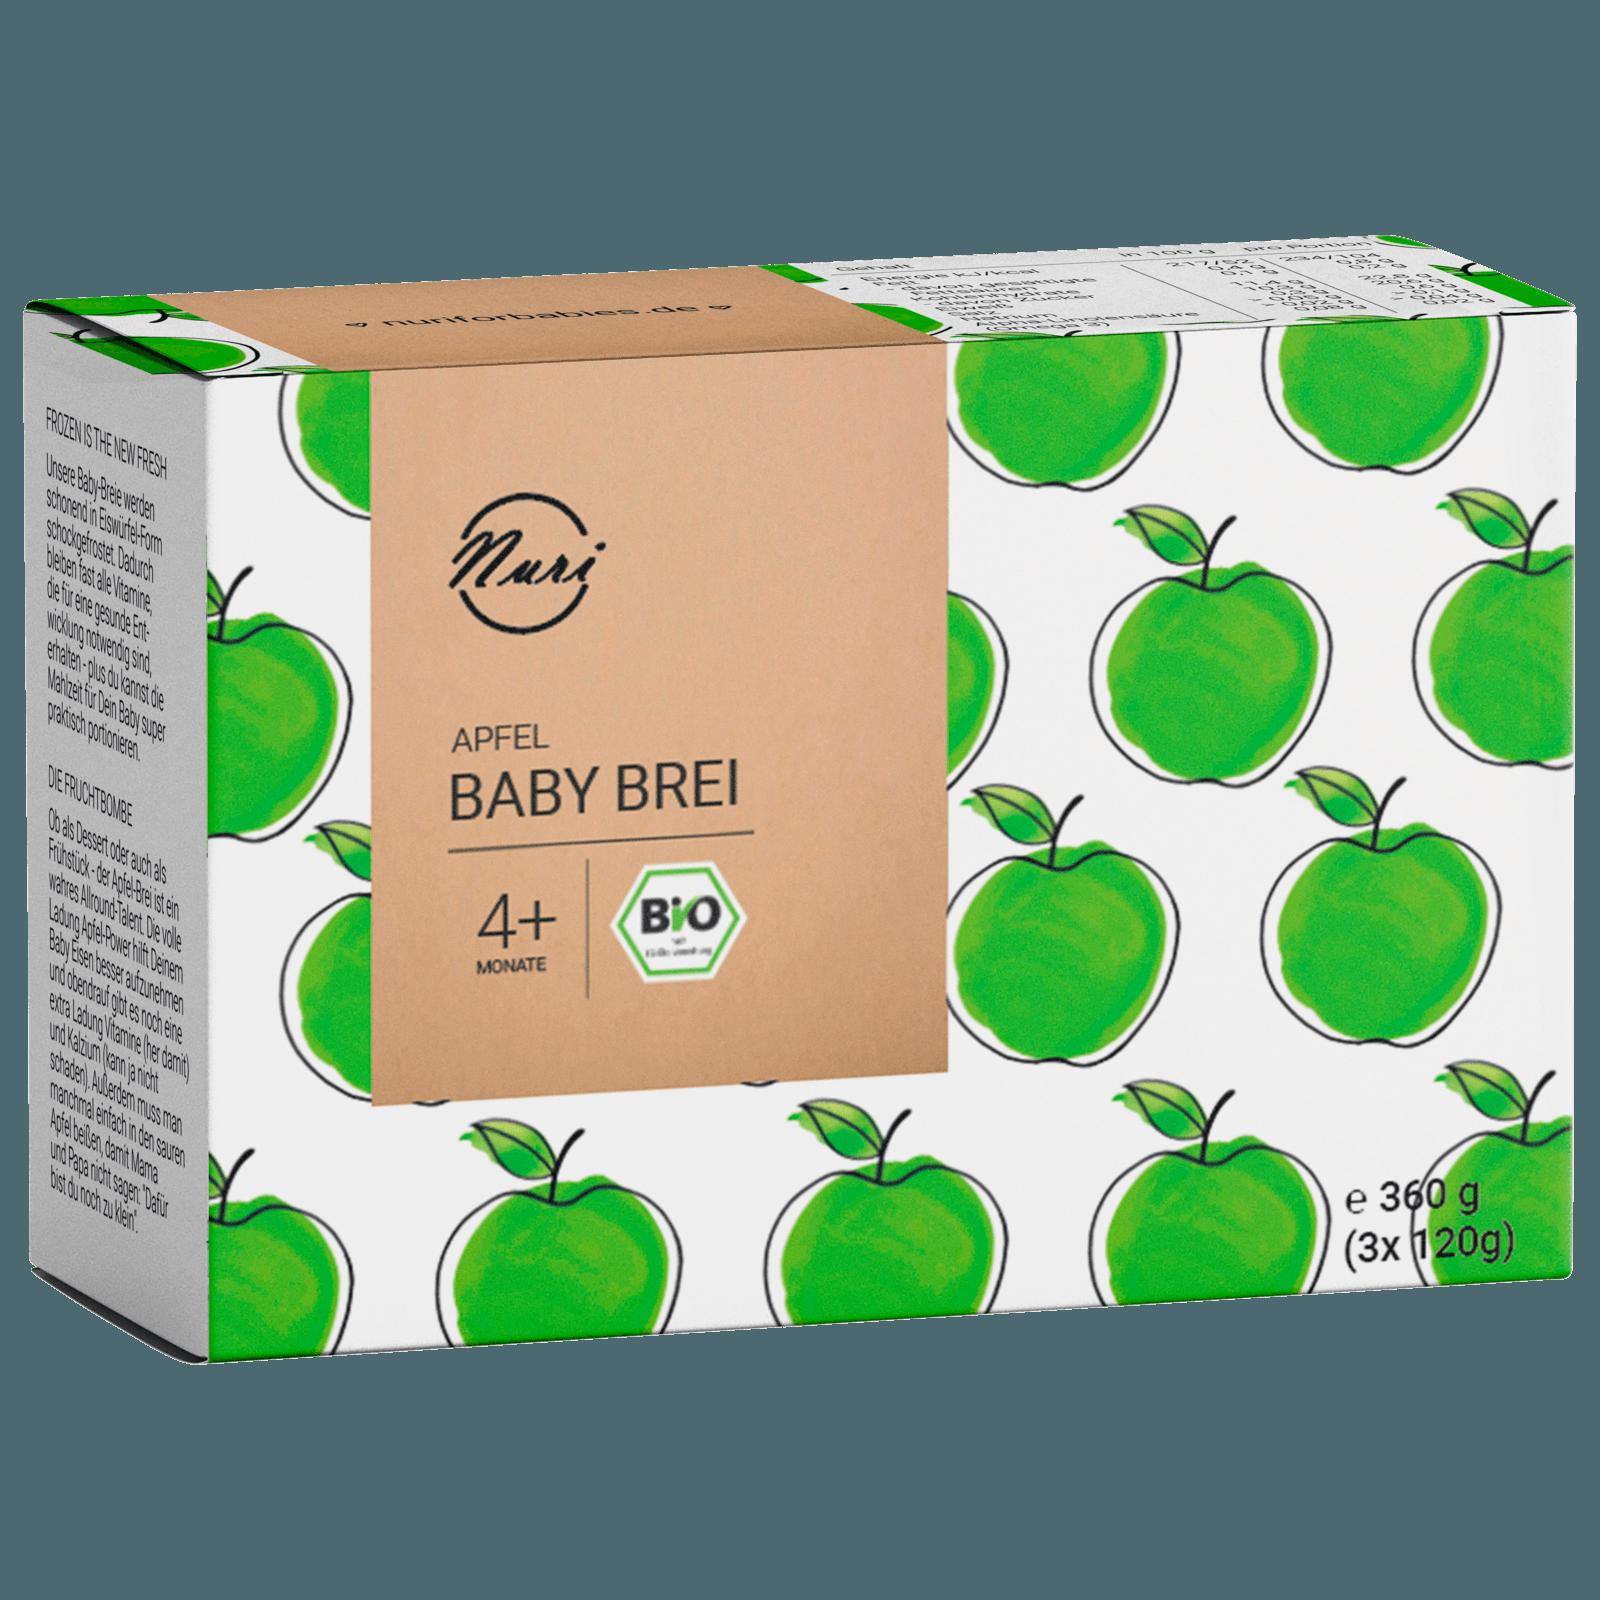 Nuri Bio Baby Brei Apfel 2x190g